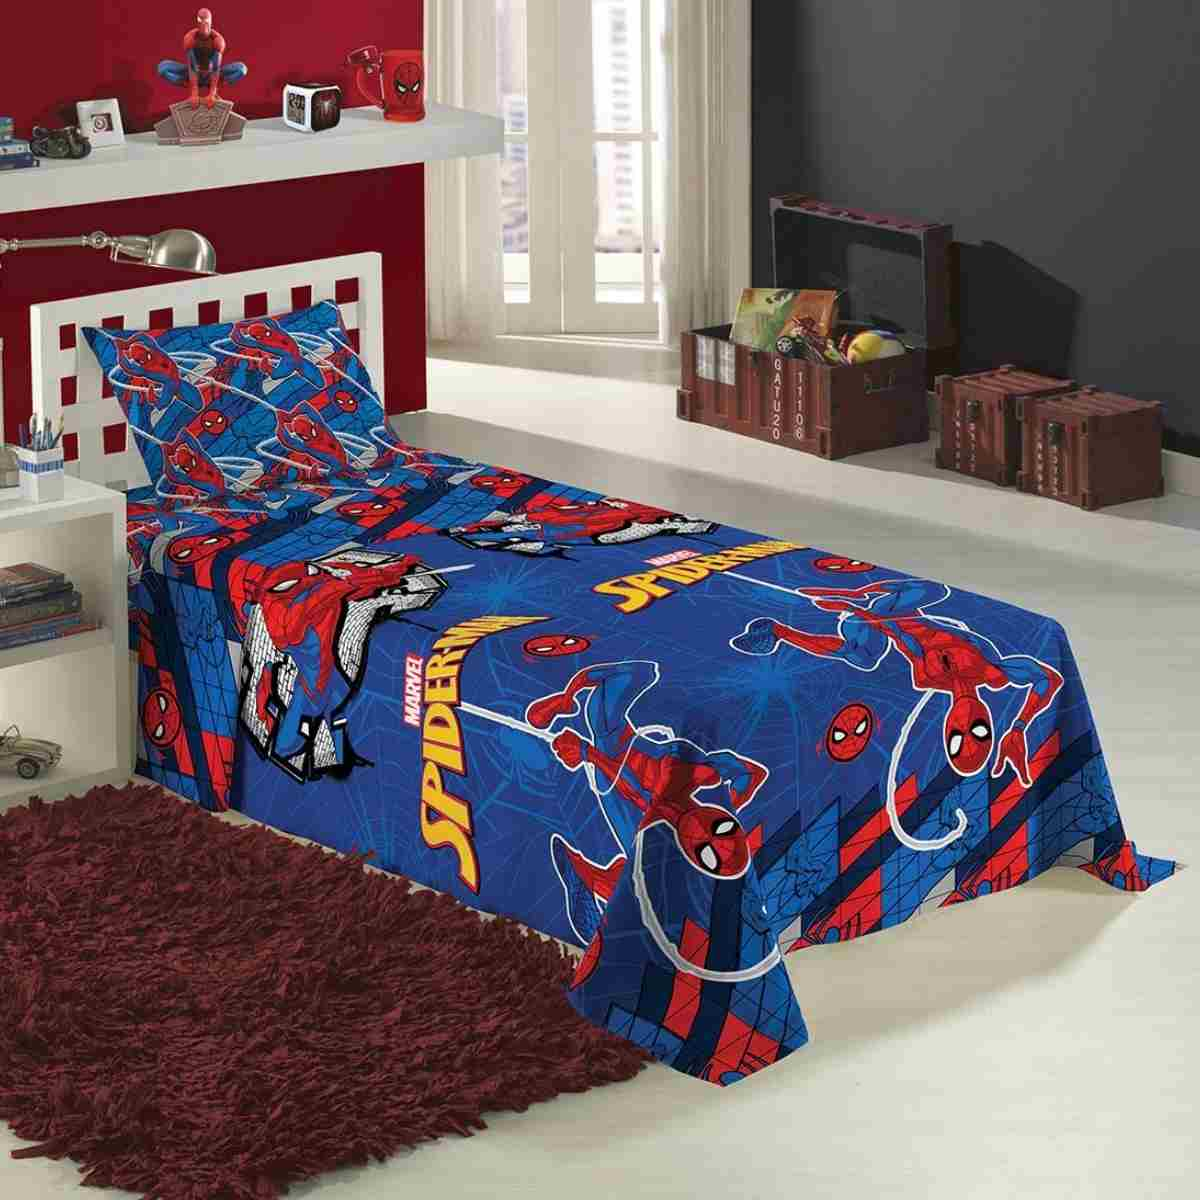 Jogo de Cama Infantil 2 Pcs - Spider-Man